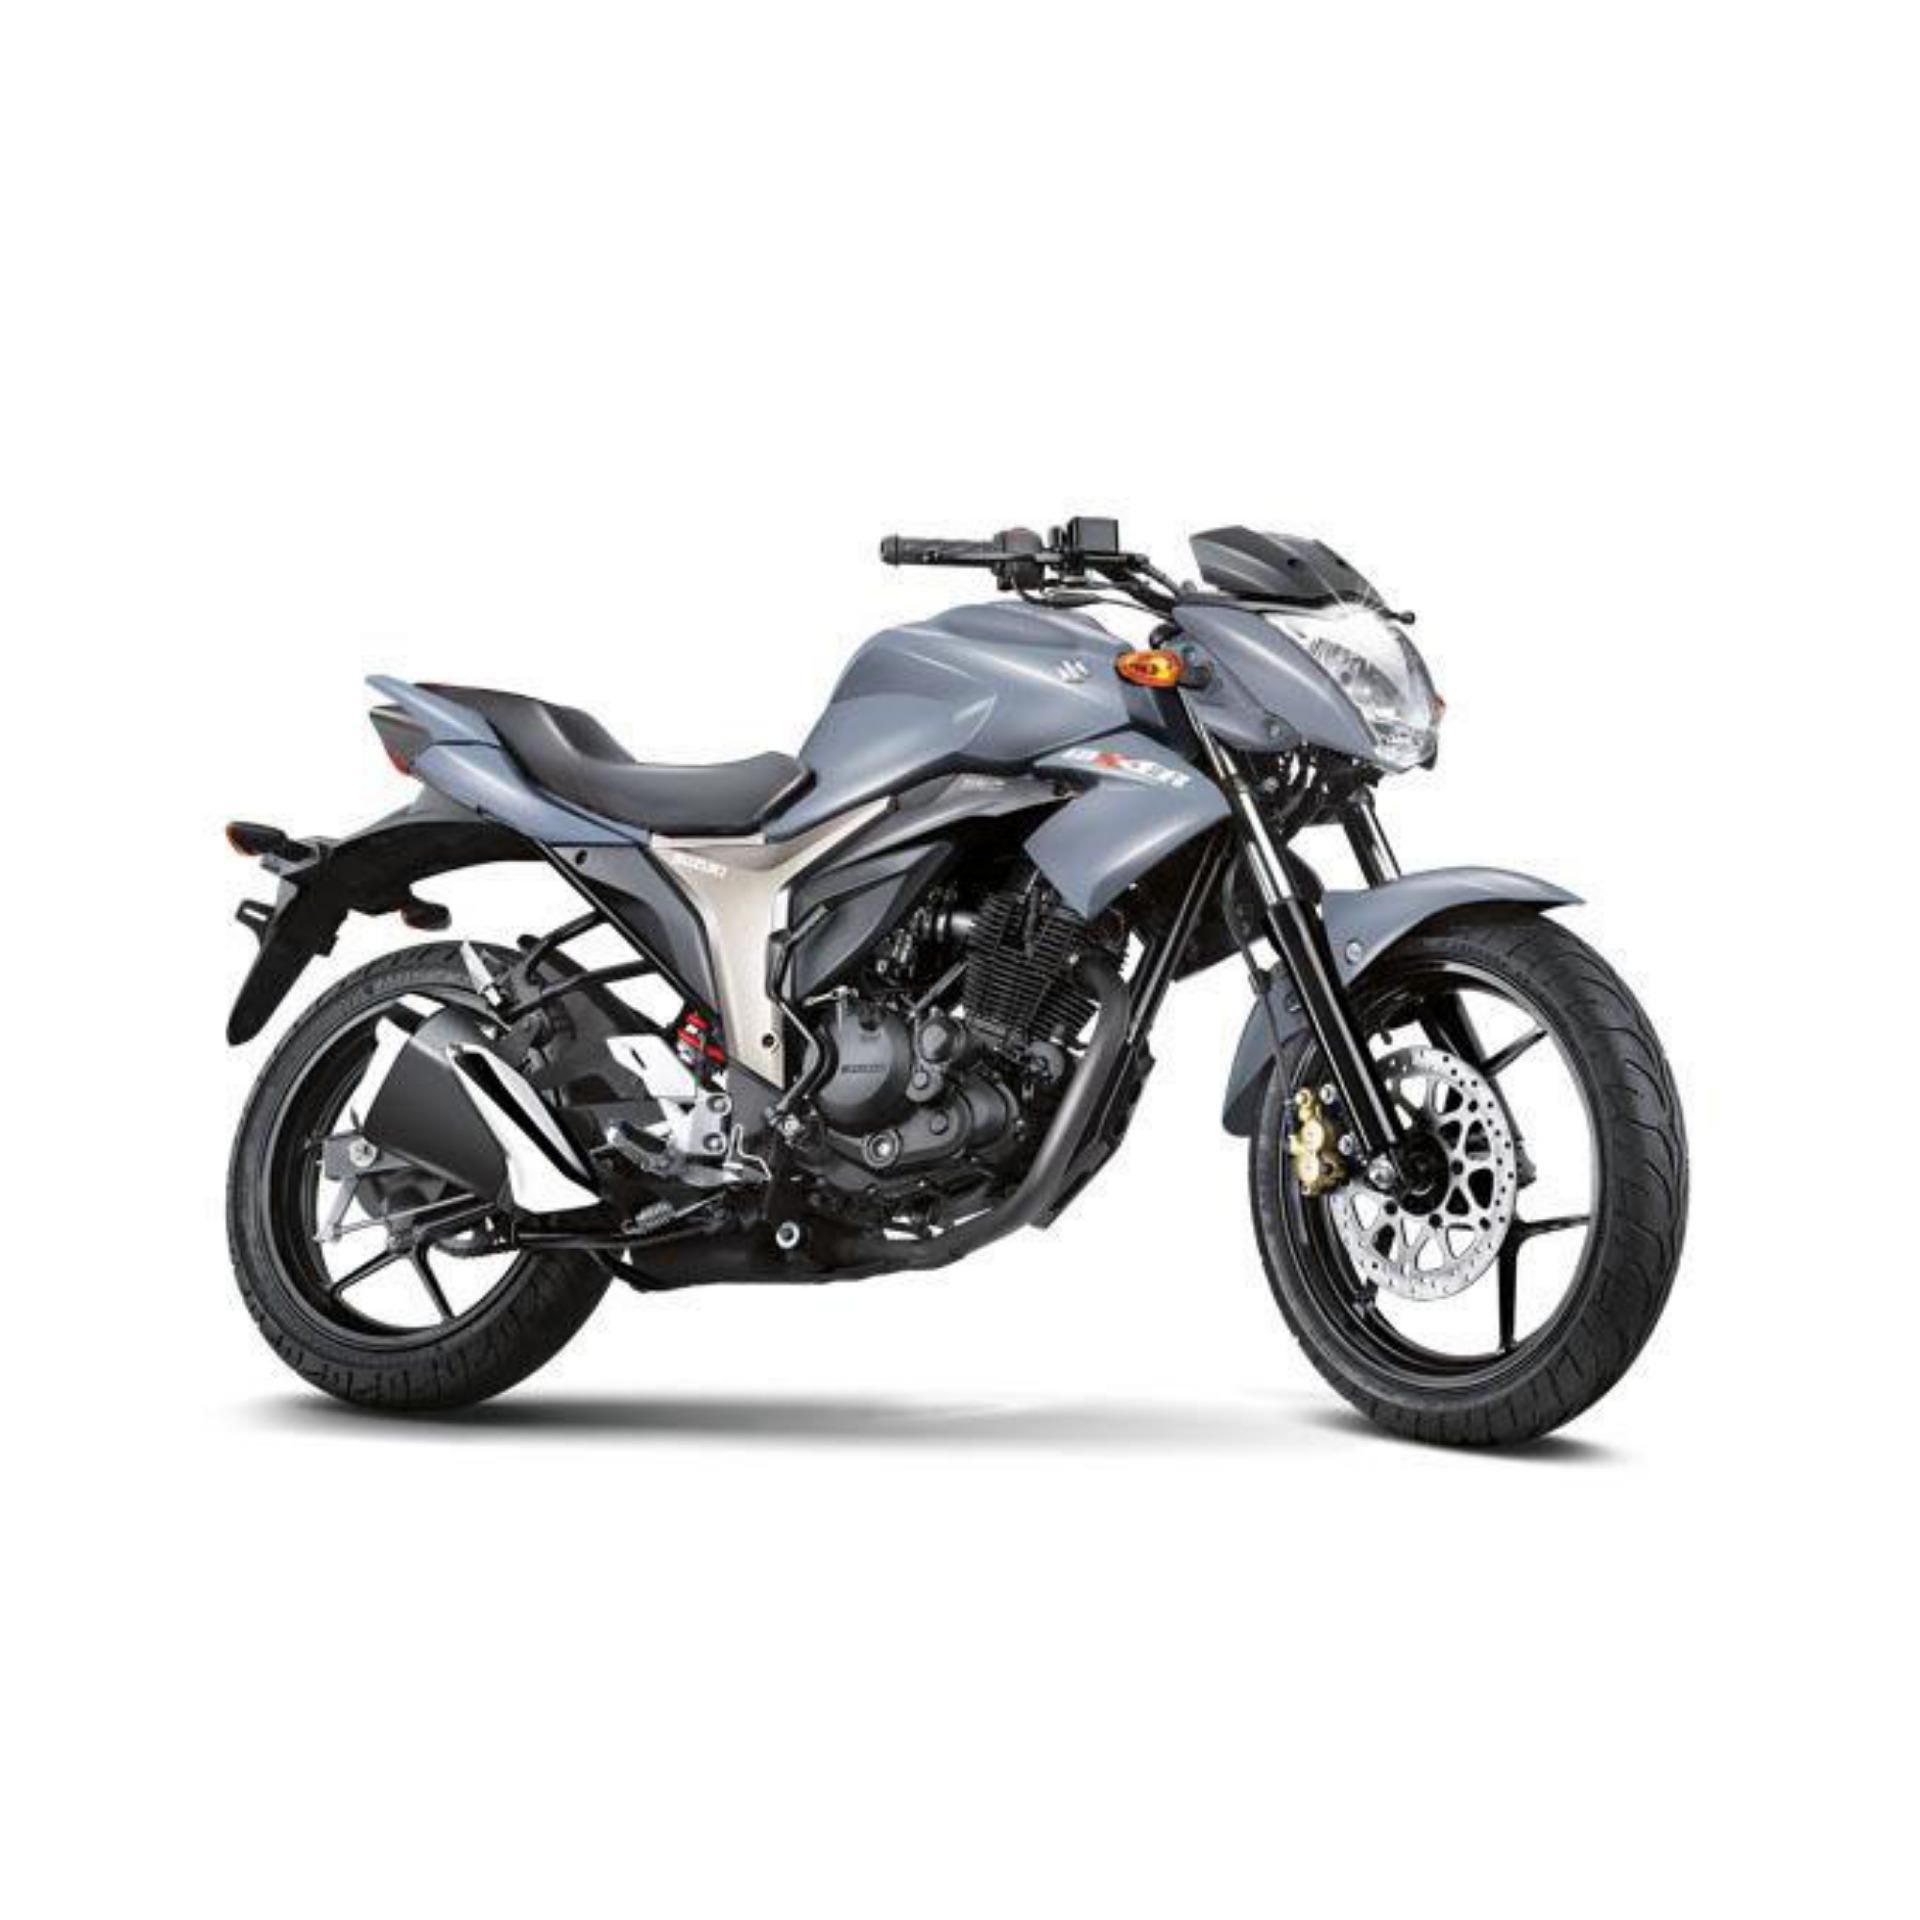 Suzuki Bike Price In Bangladesh Suzuki Motorcycle At Daraz Com Bd